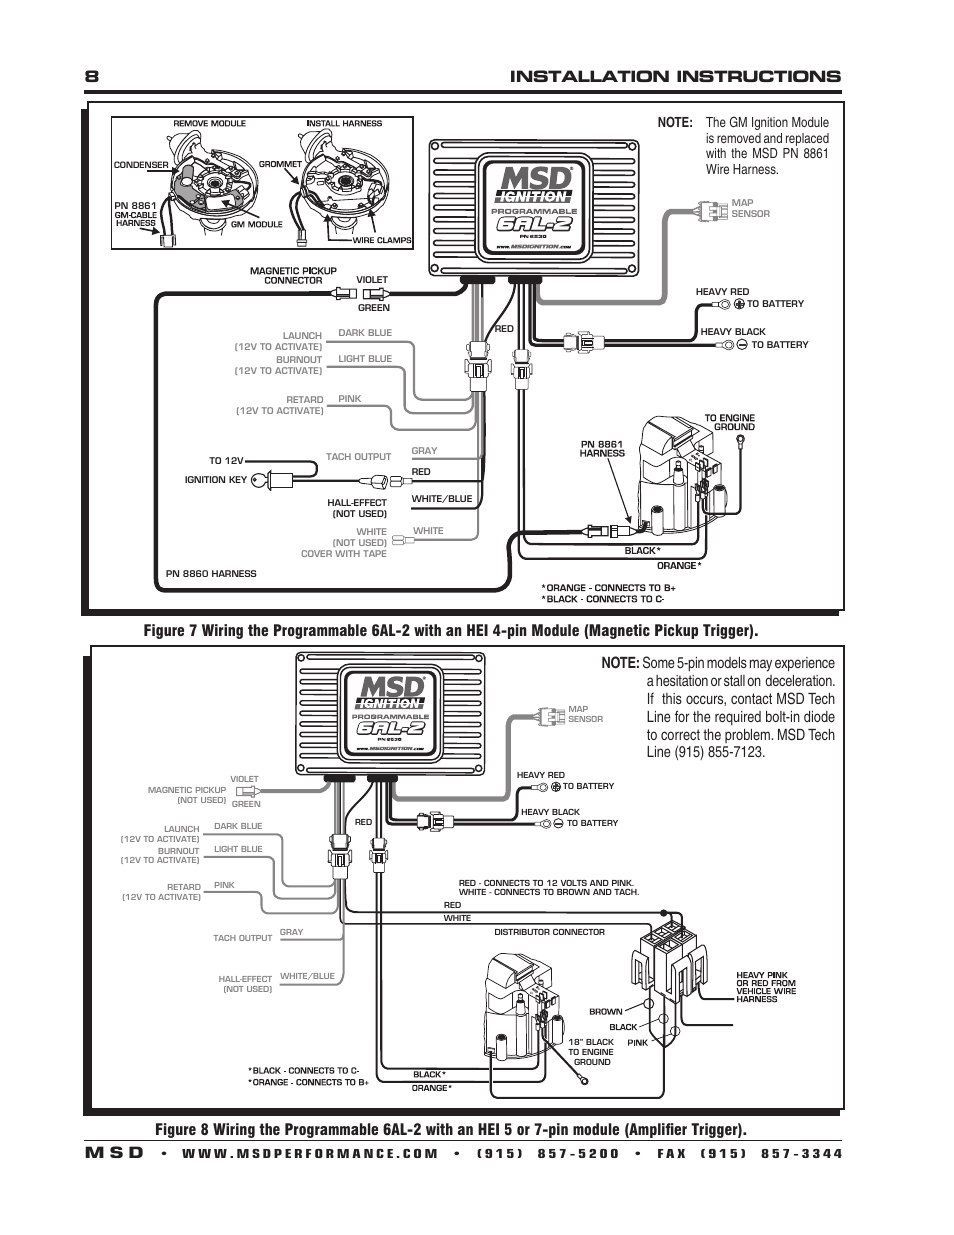 msd 6al wiring diagram hei. Black Bedroom Furniture Sets. Home Design Ideas